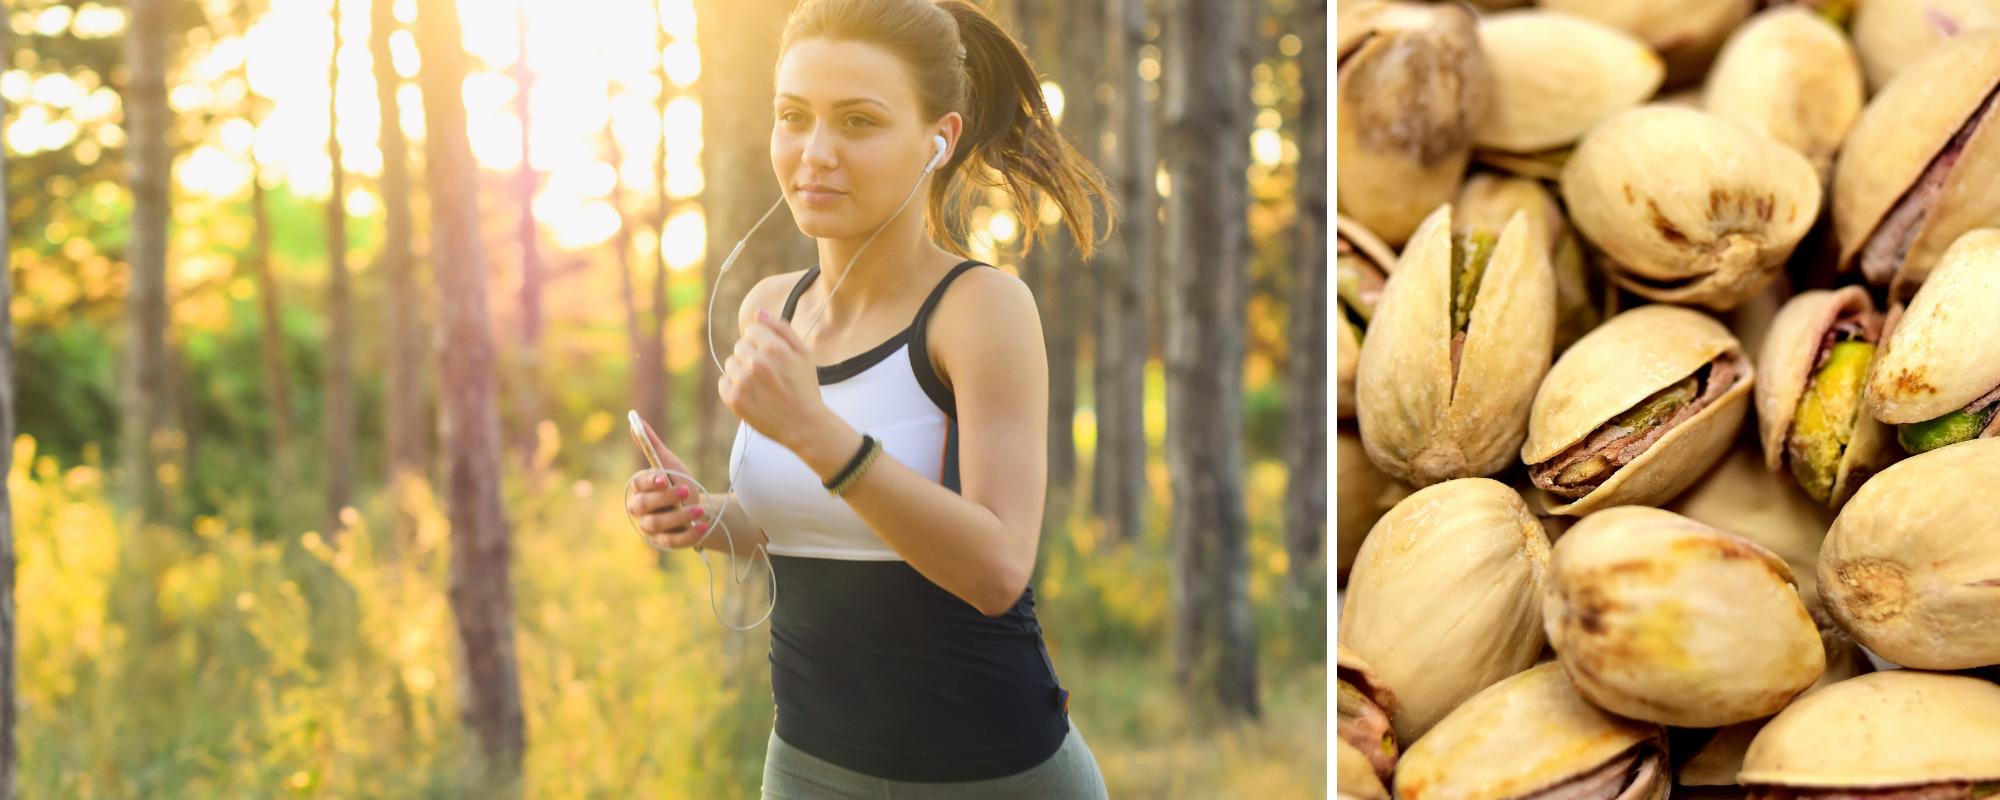 Blood pressure: exercise & pistachios